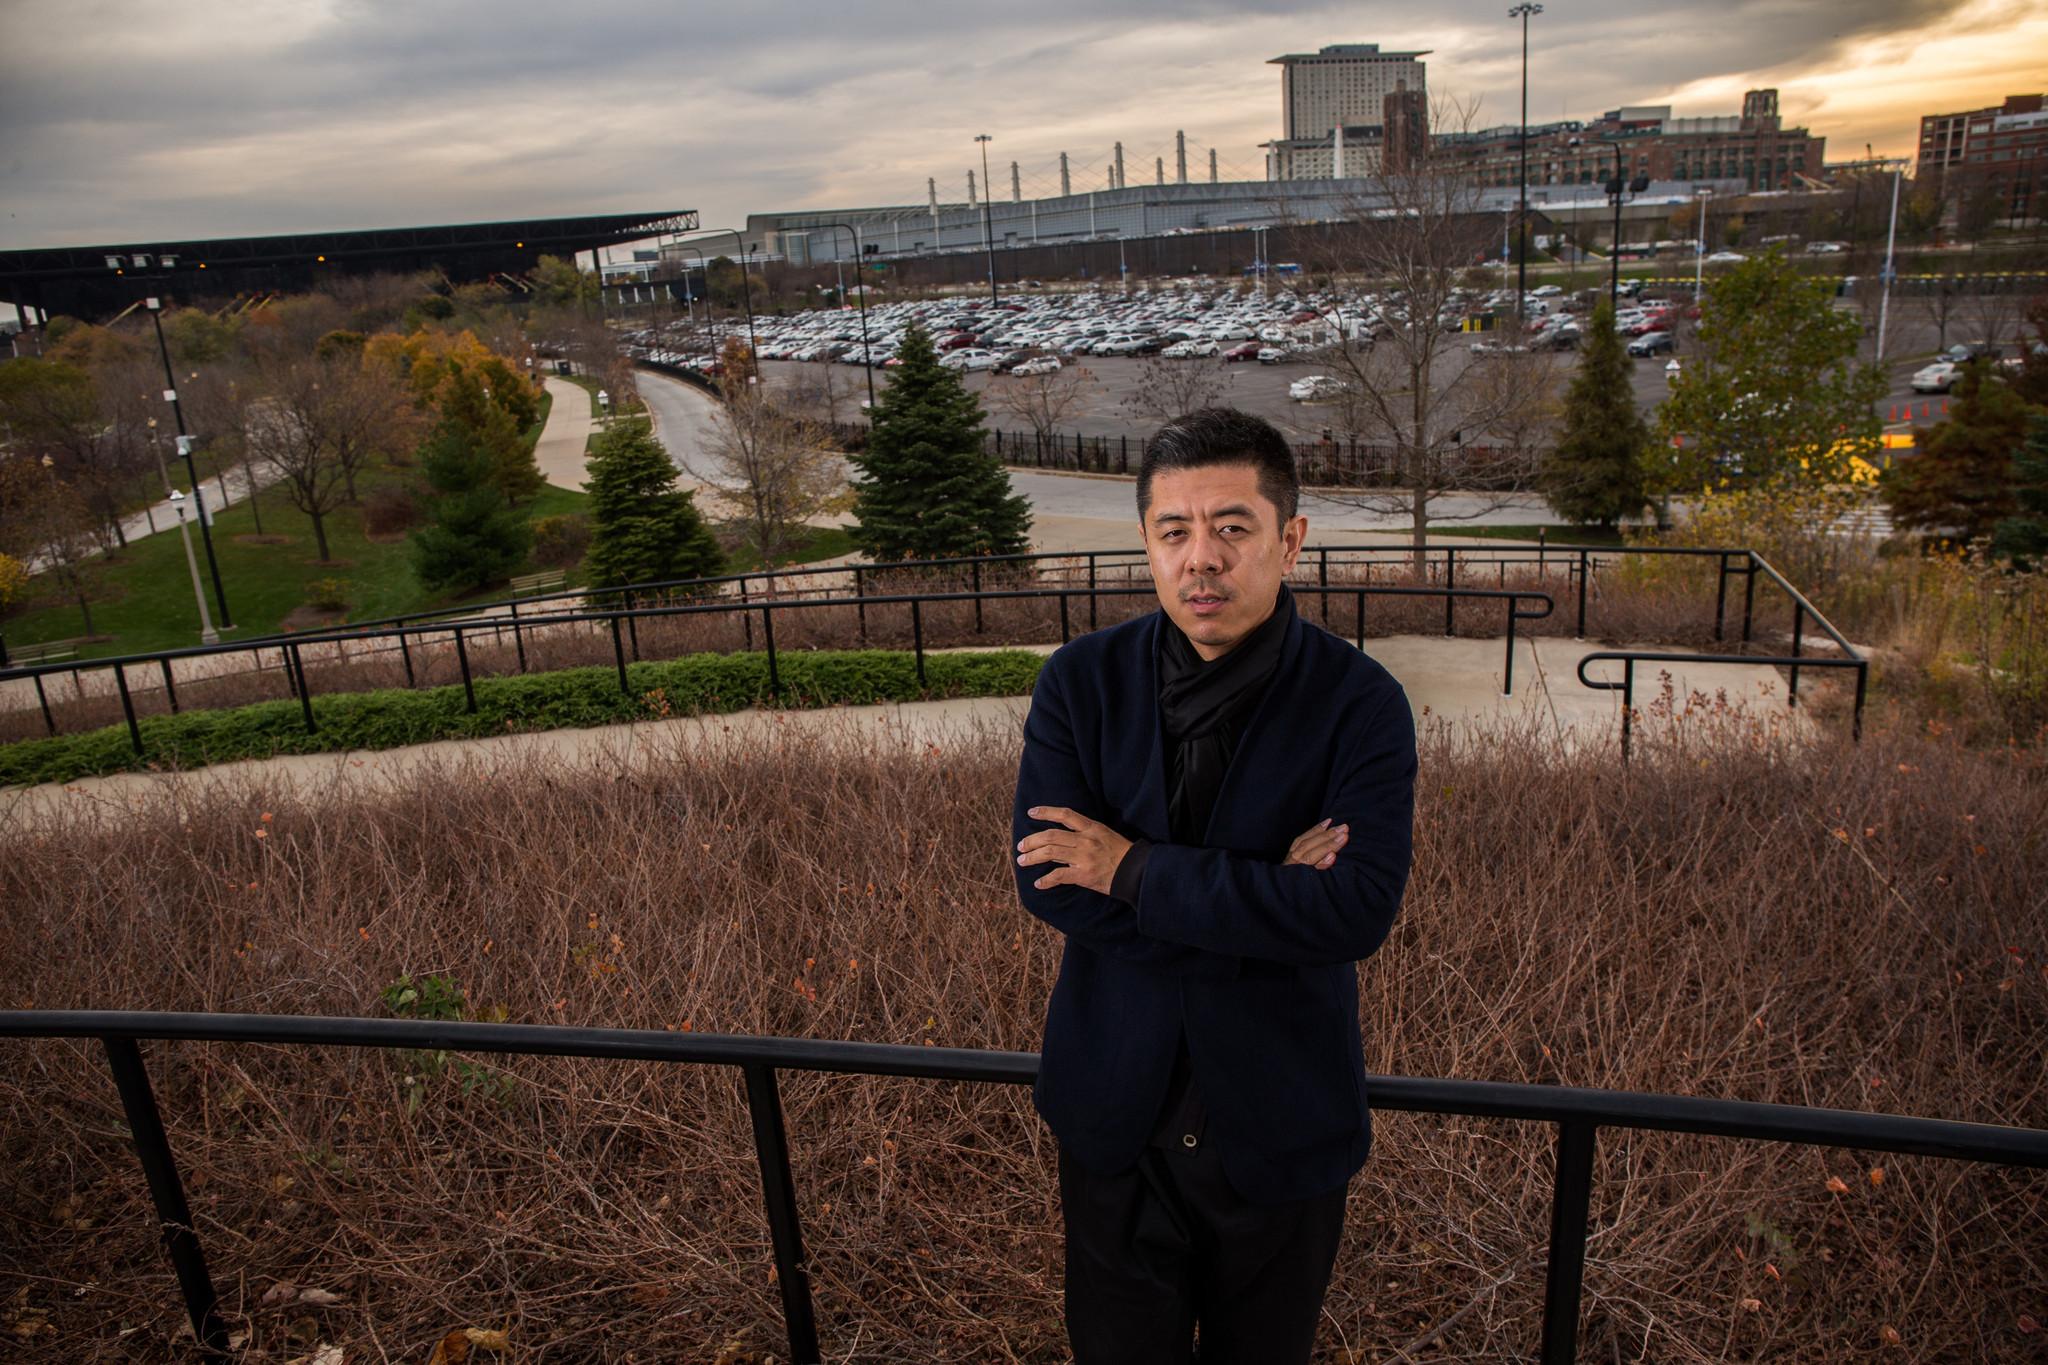 Lucas Museum abandons Chicago, blames parks group